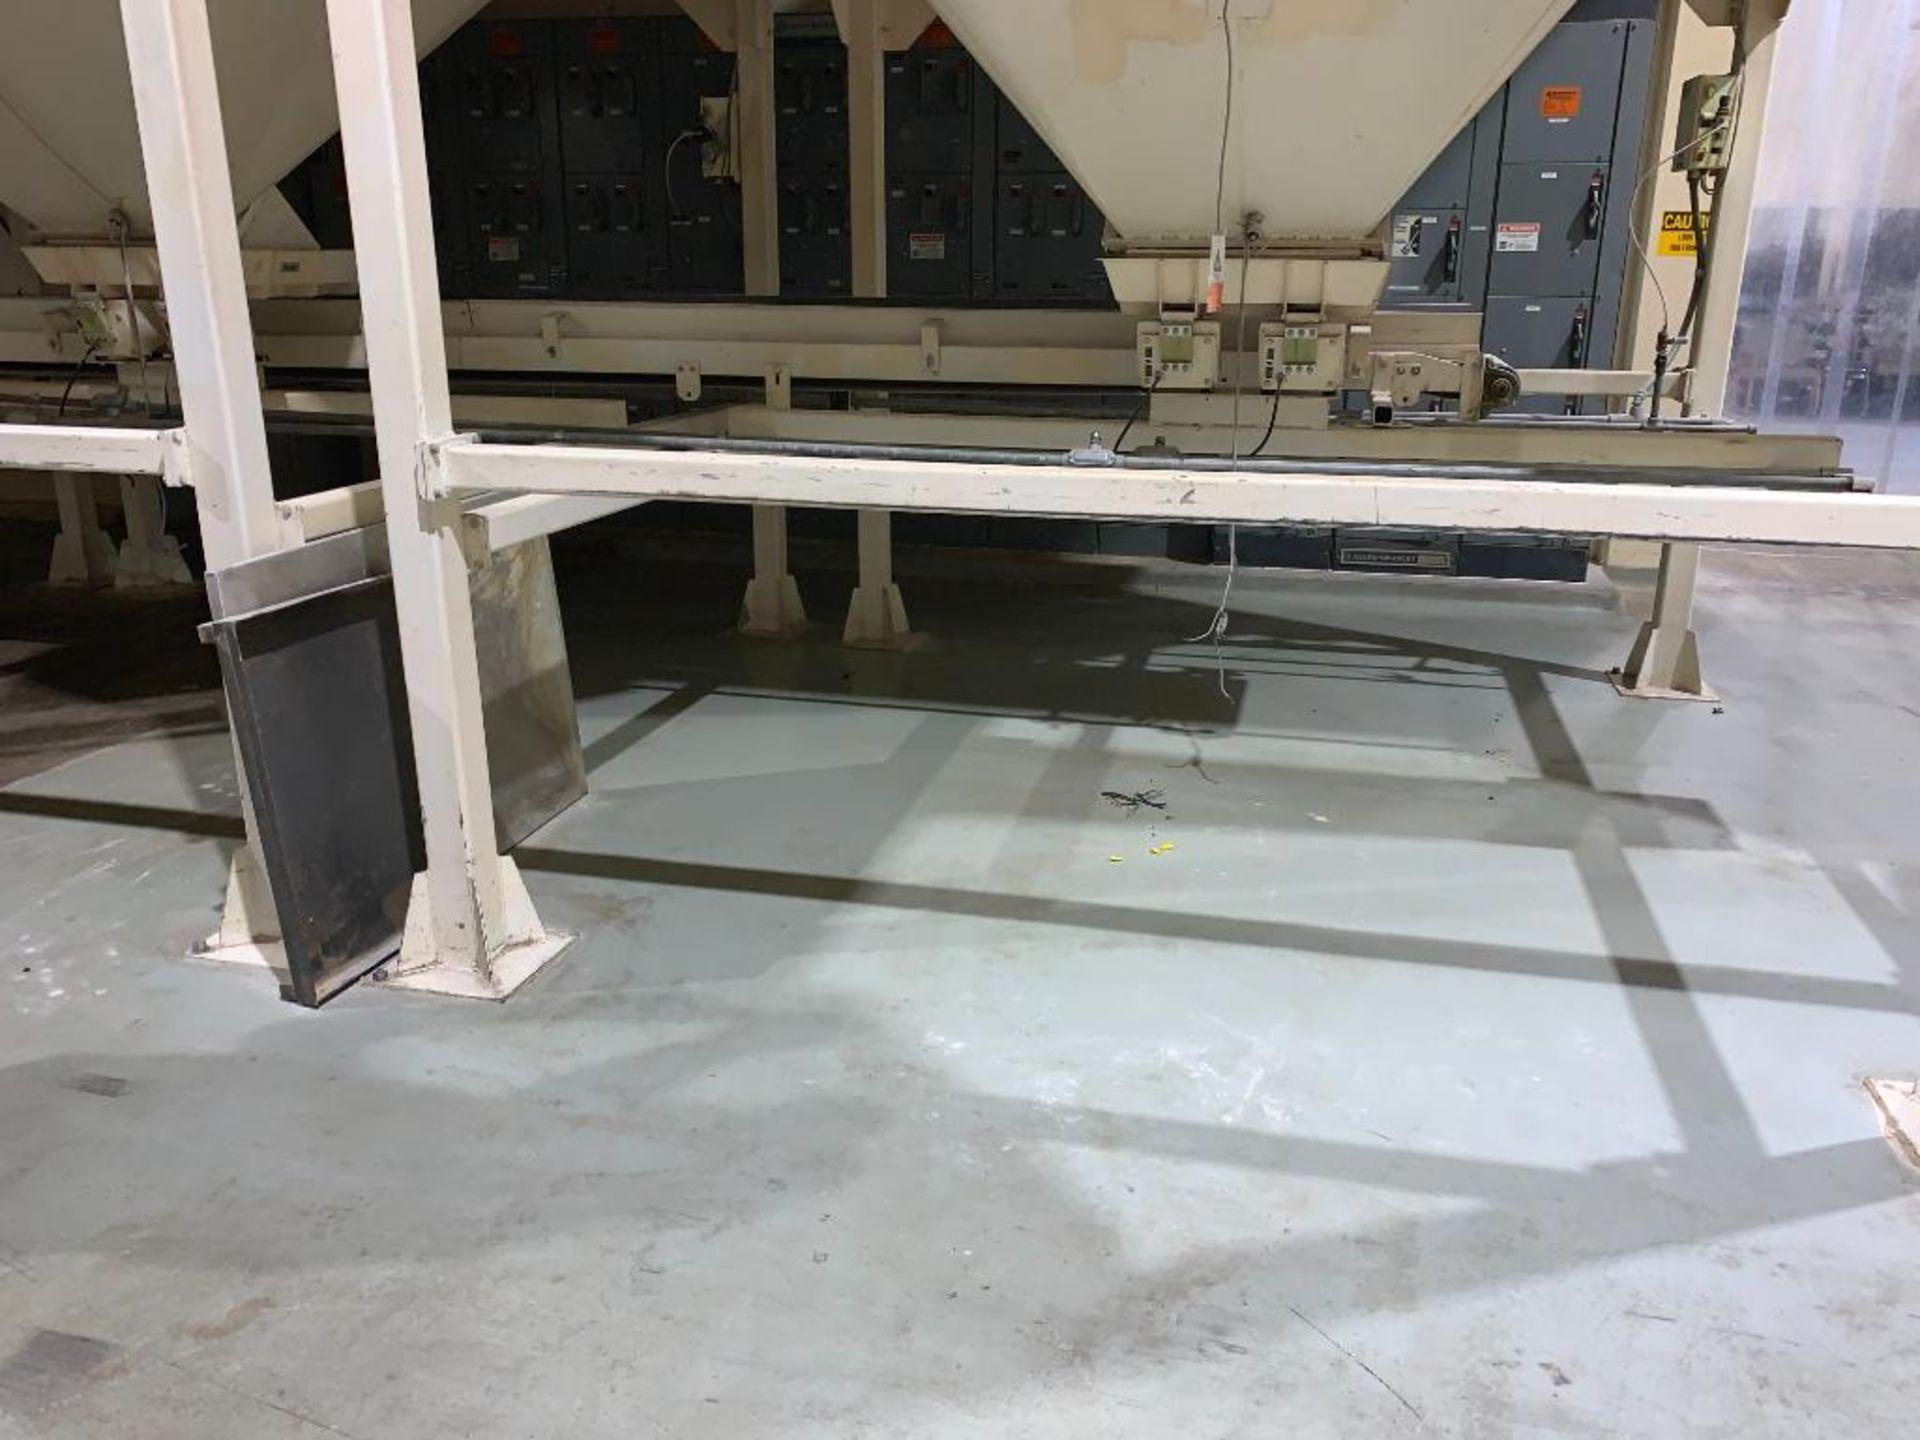 Aseeco mild steel cone bottom bulk storage bin - Image 3 of 16